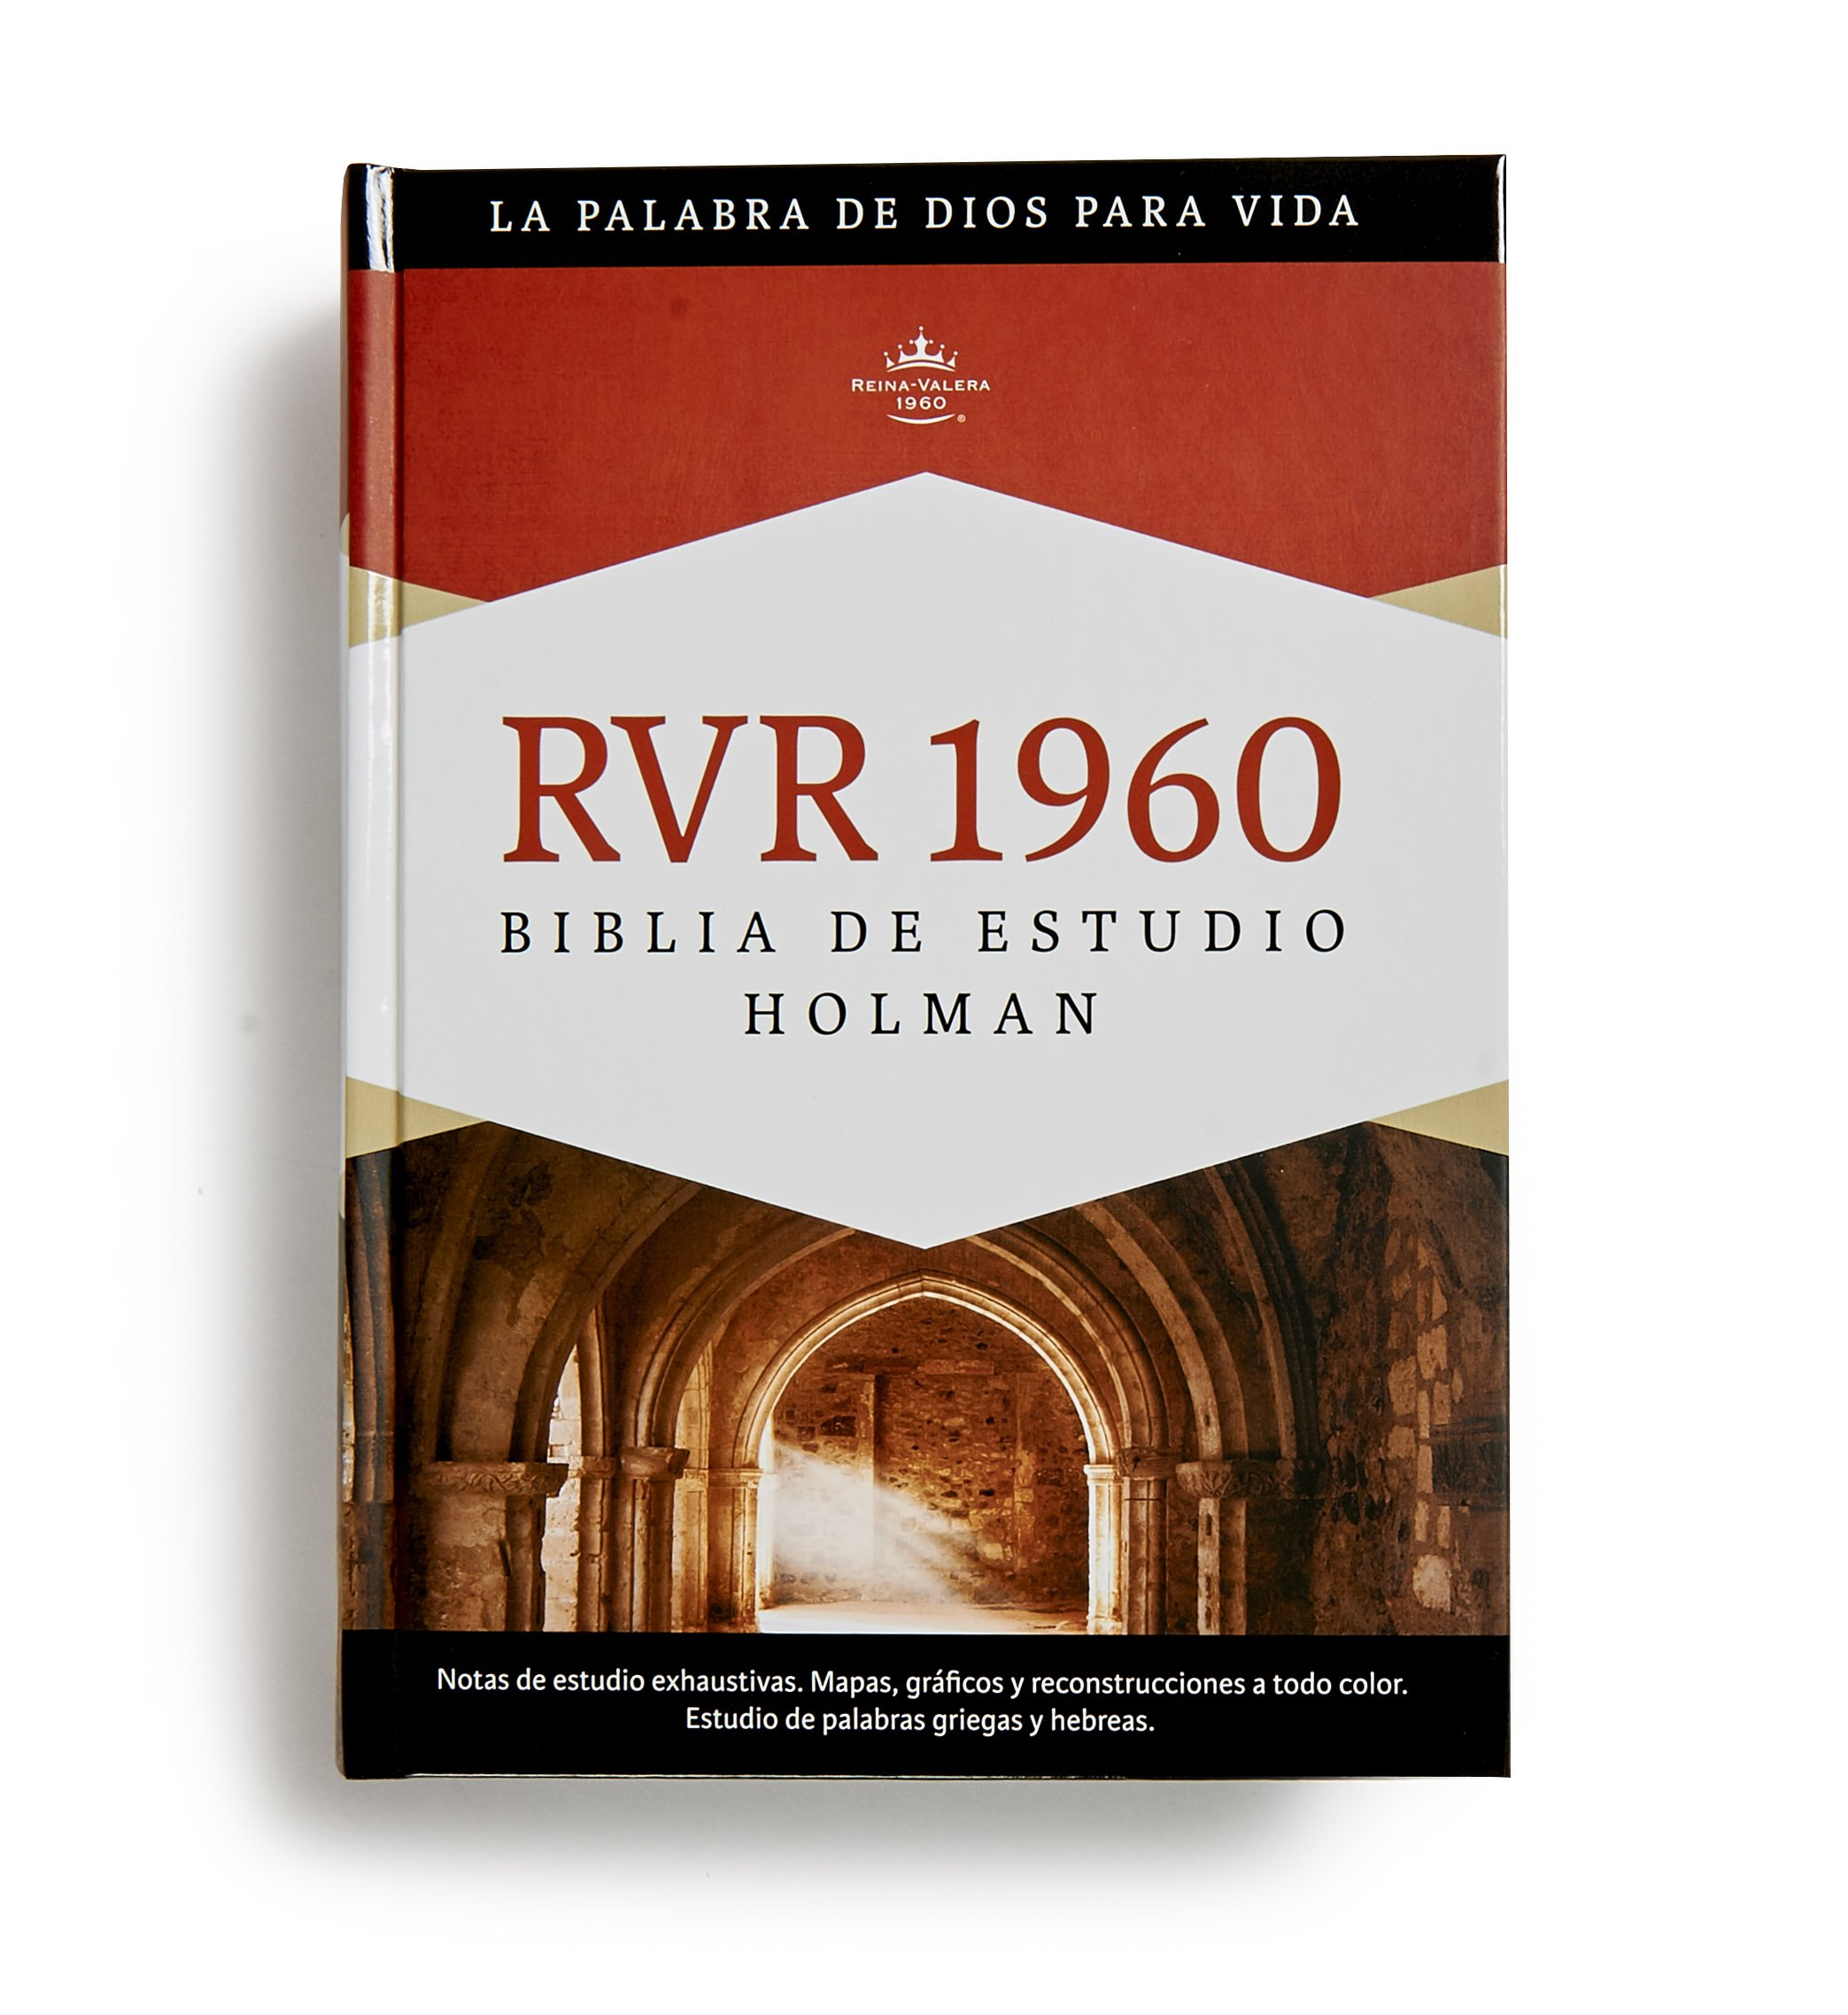 Biblia de Estudio Holman-Rvr 1960 = Holman Study Bible-Rvr 1960: Amazon.de:  B&h Espanol Editorial, Jeremy Royal Howard: Fremdsprachige Bücher